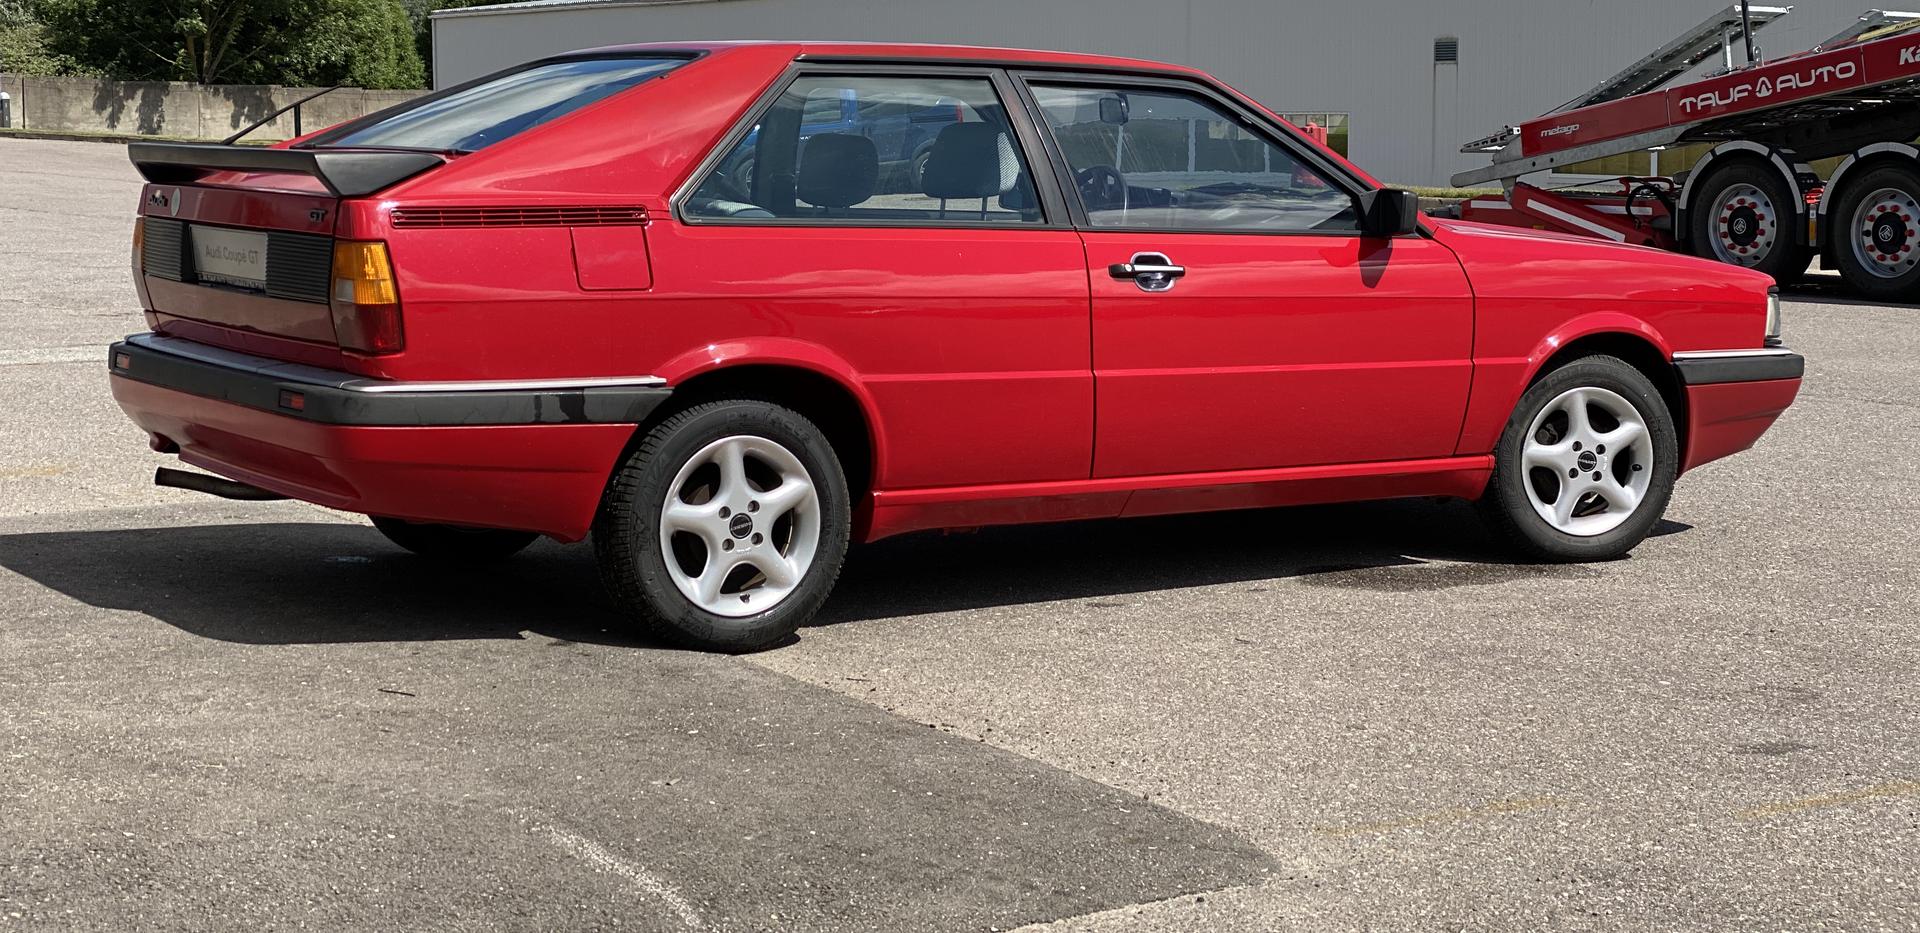 Audi Coupe GT 1987